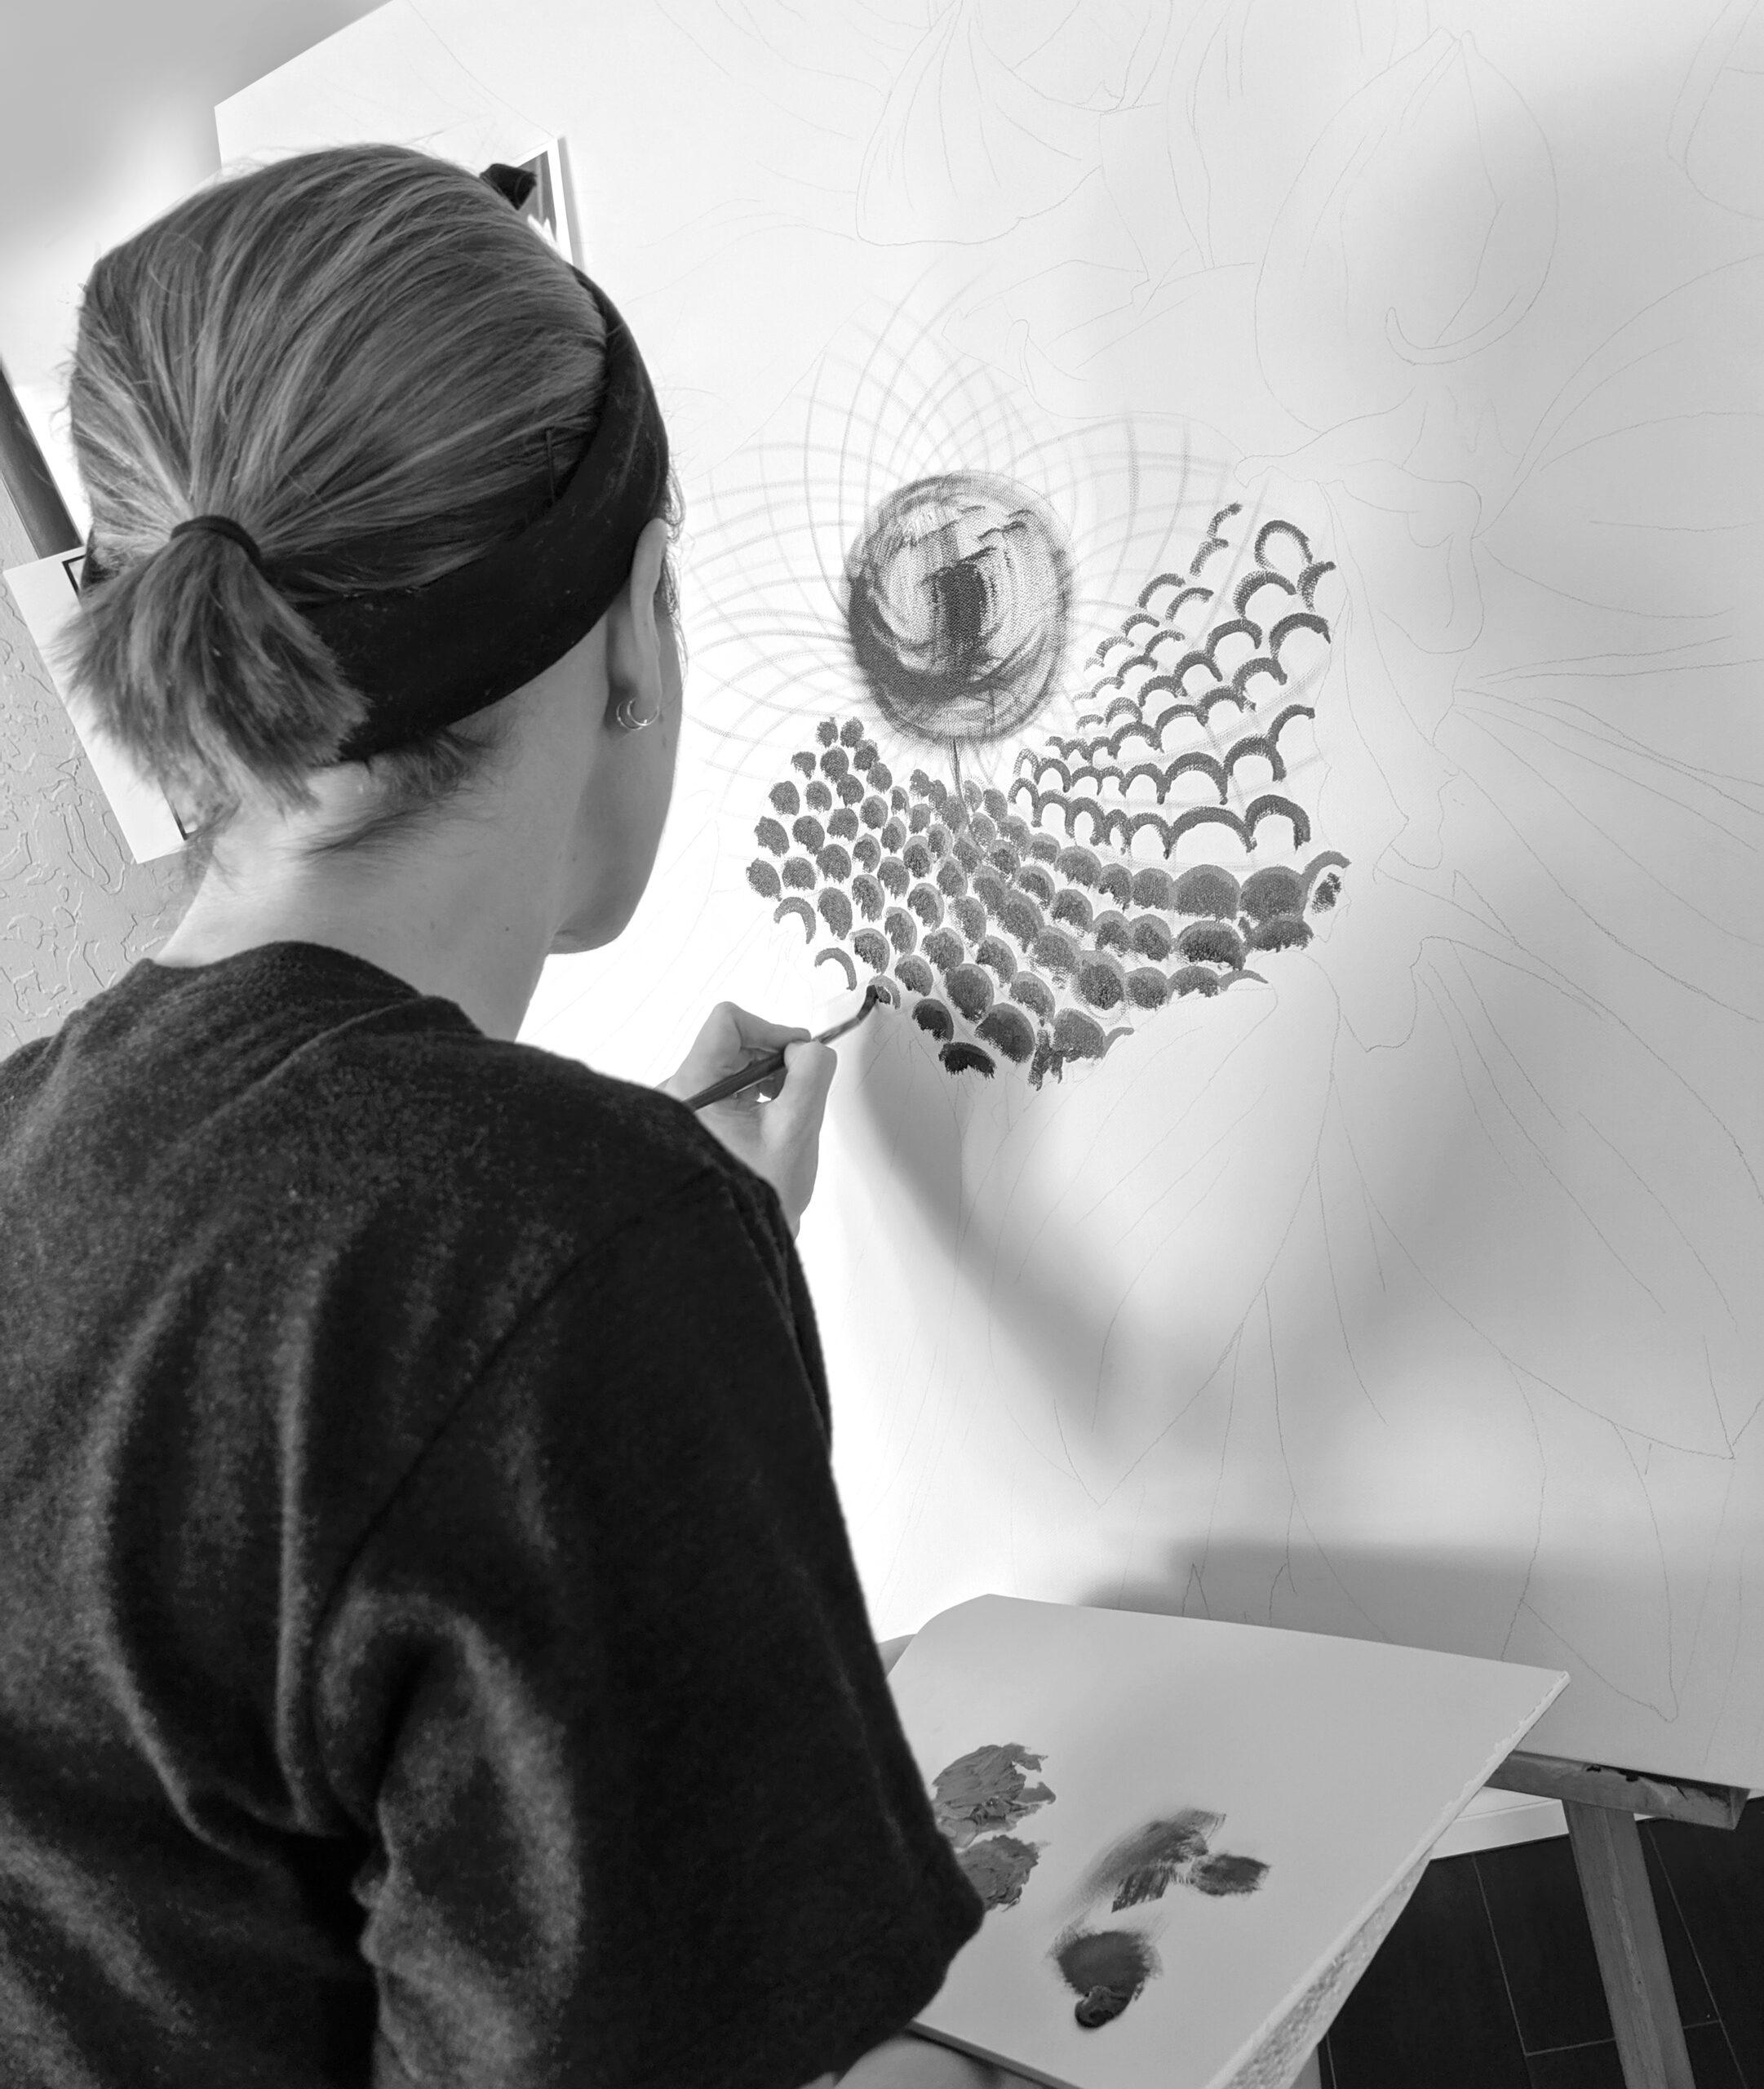 Sunflower Painting in Progress